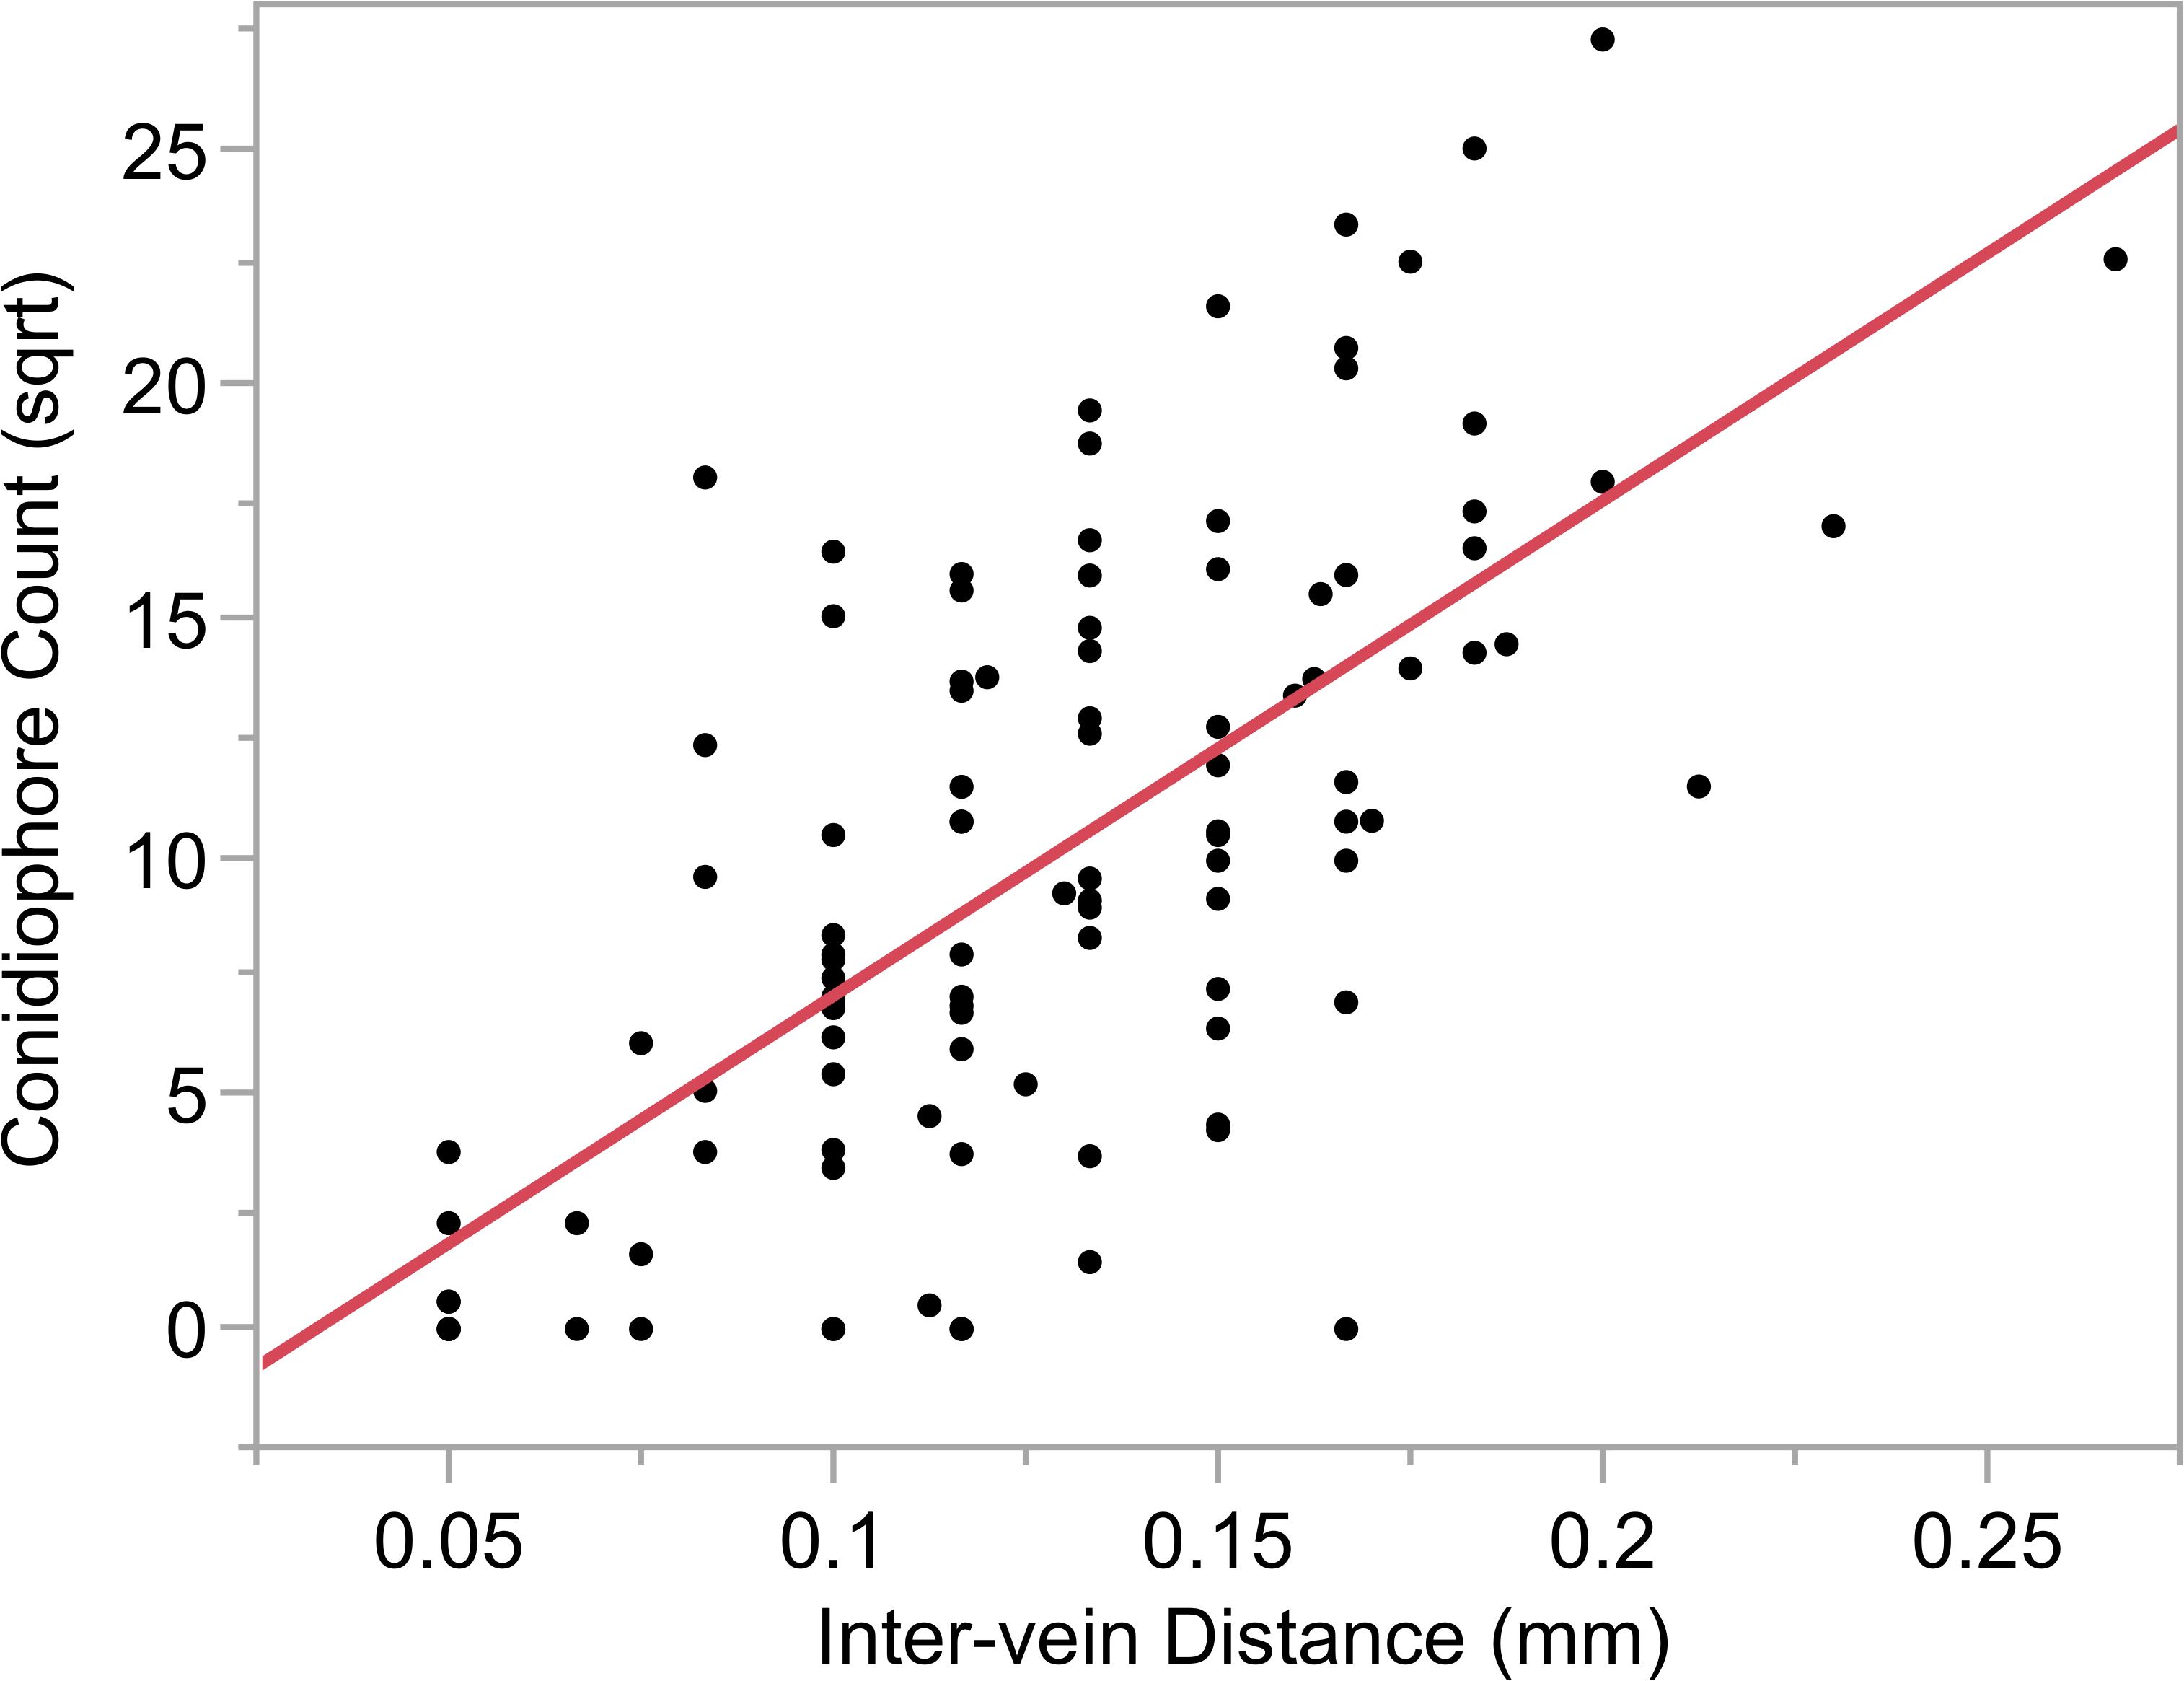 Relationship between conidiophore count and intervein distance.